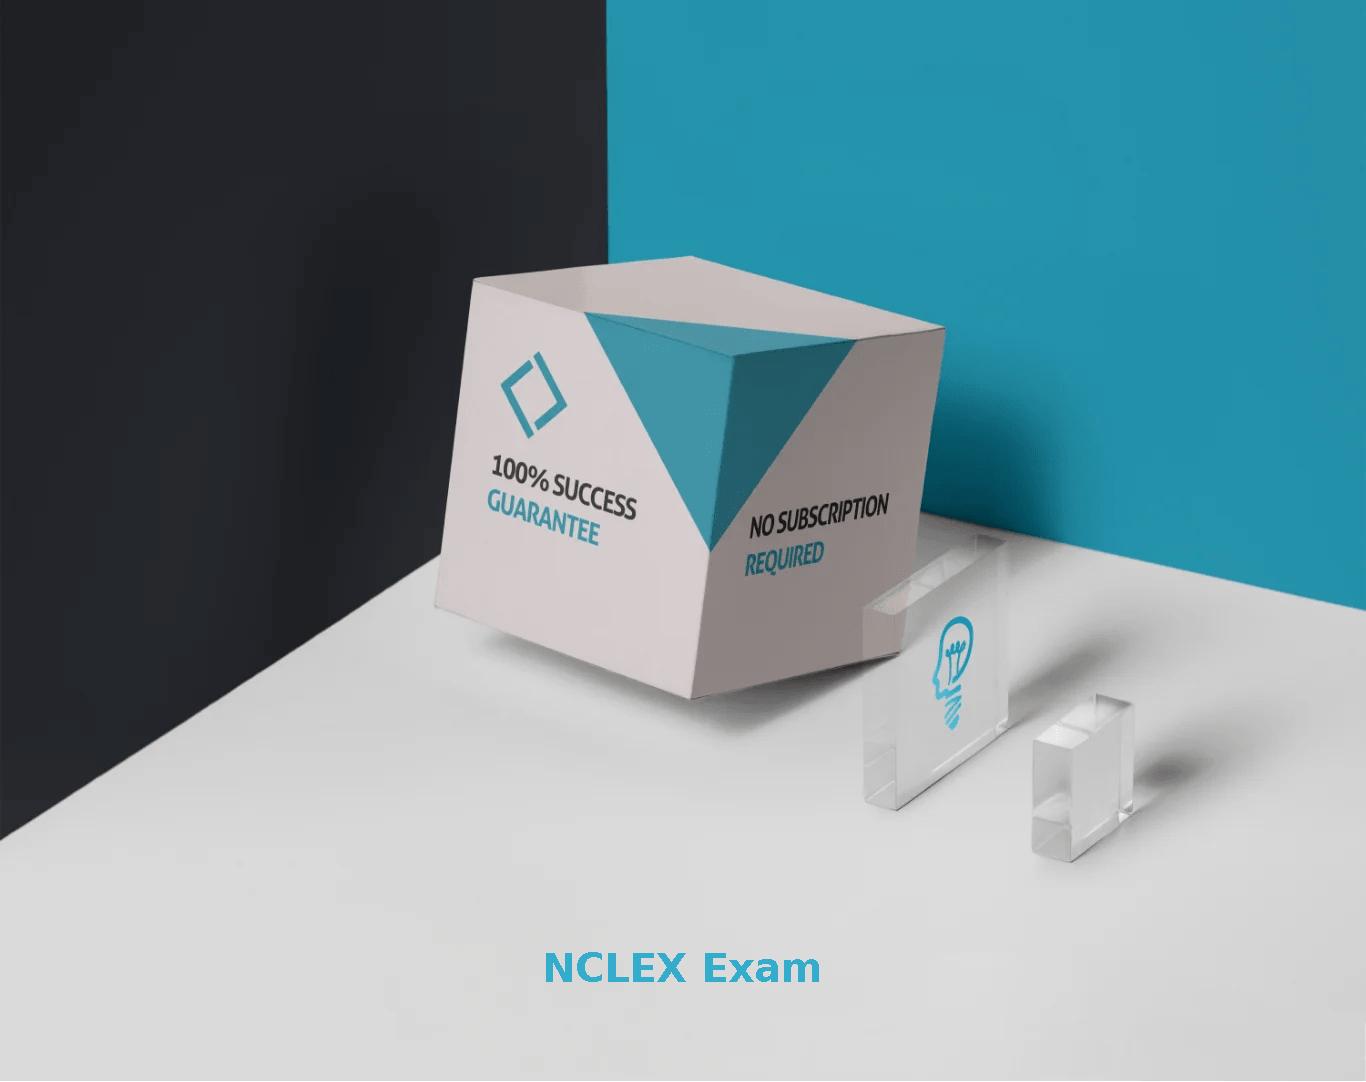 NCLEX Exam Dumps